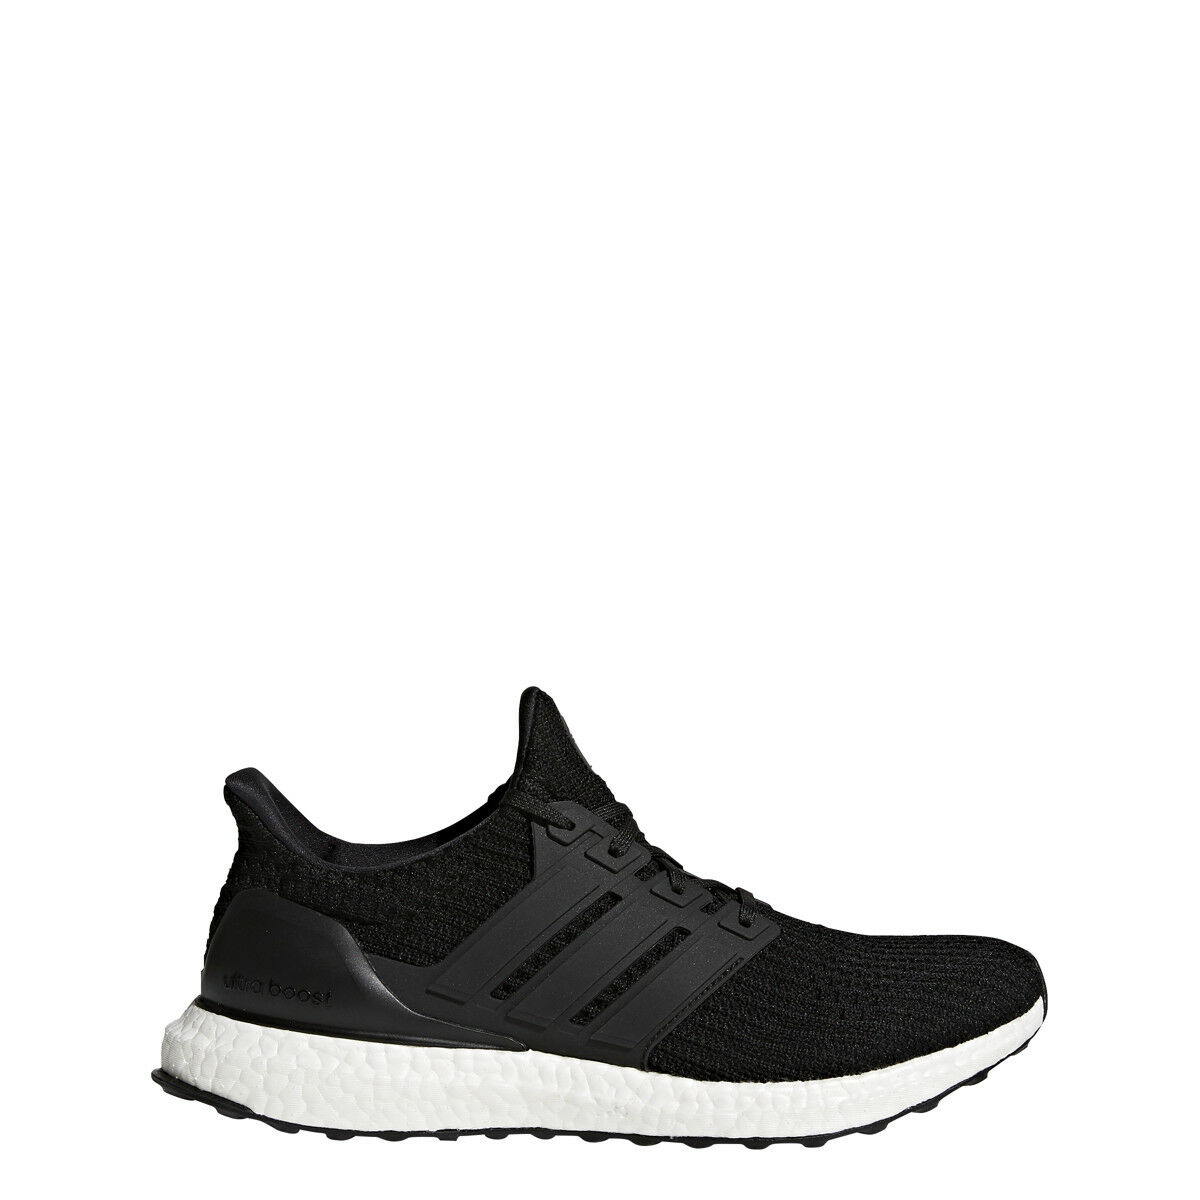 New Men's ADIDAS UltraBoost Ultra Boost 4.0 Running Sneaker BB6166 Black White